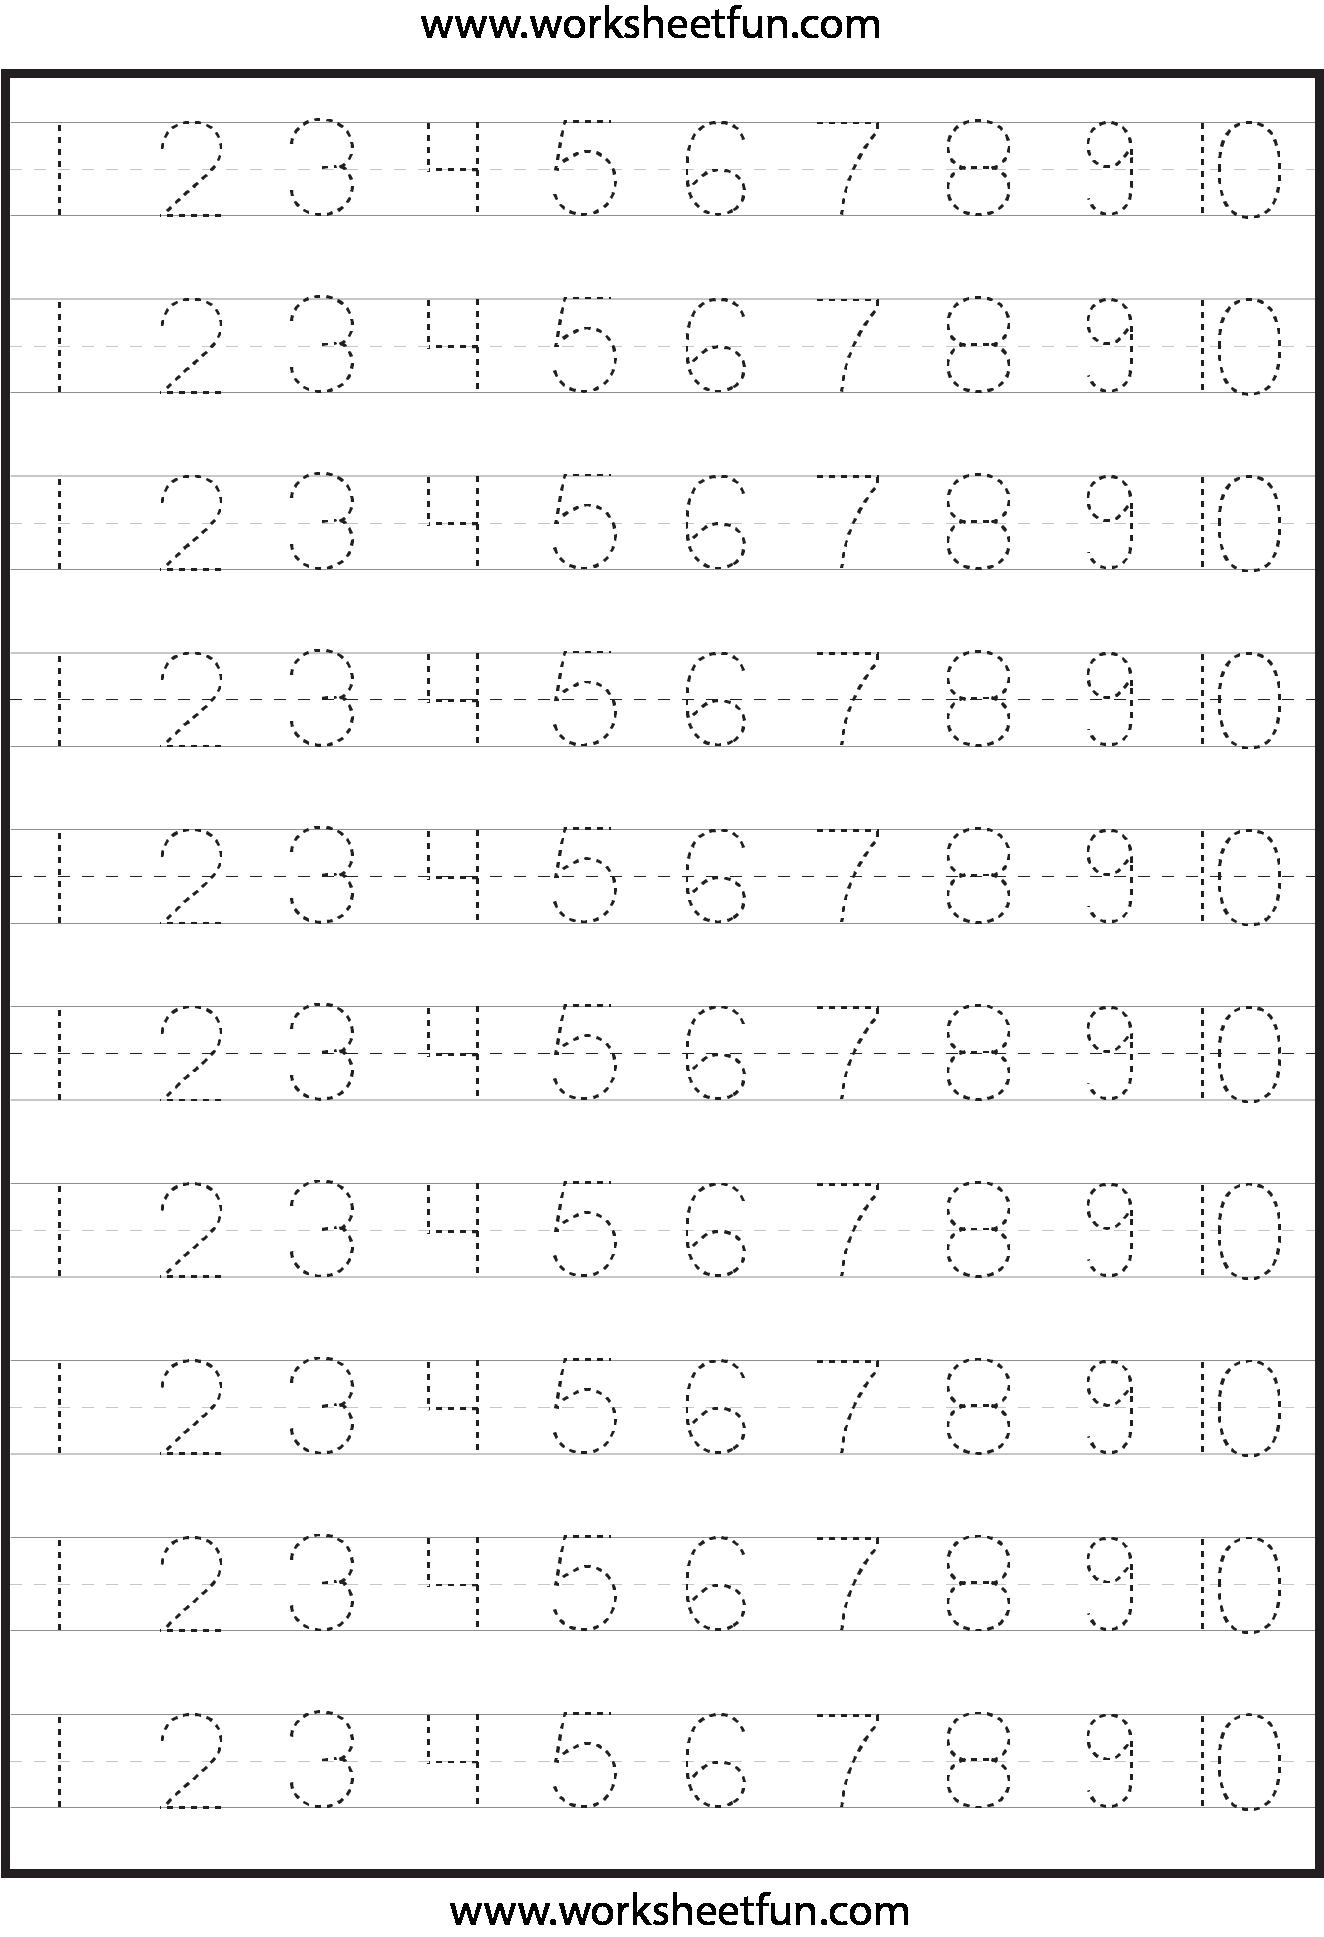 8 Best Images of Number Tracing Worksheets Free Printable - Number ...